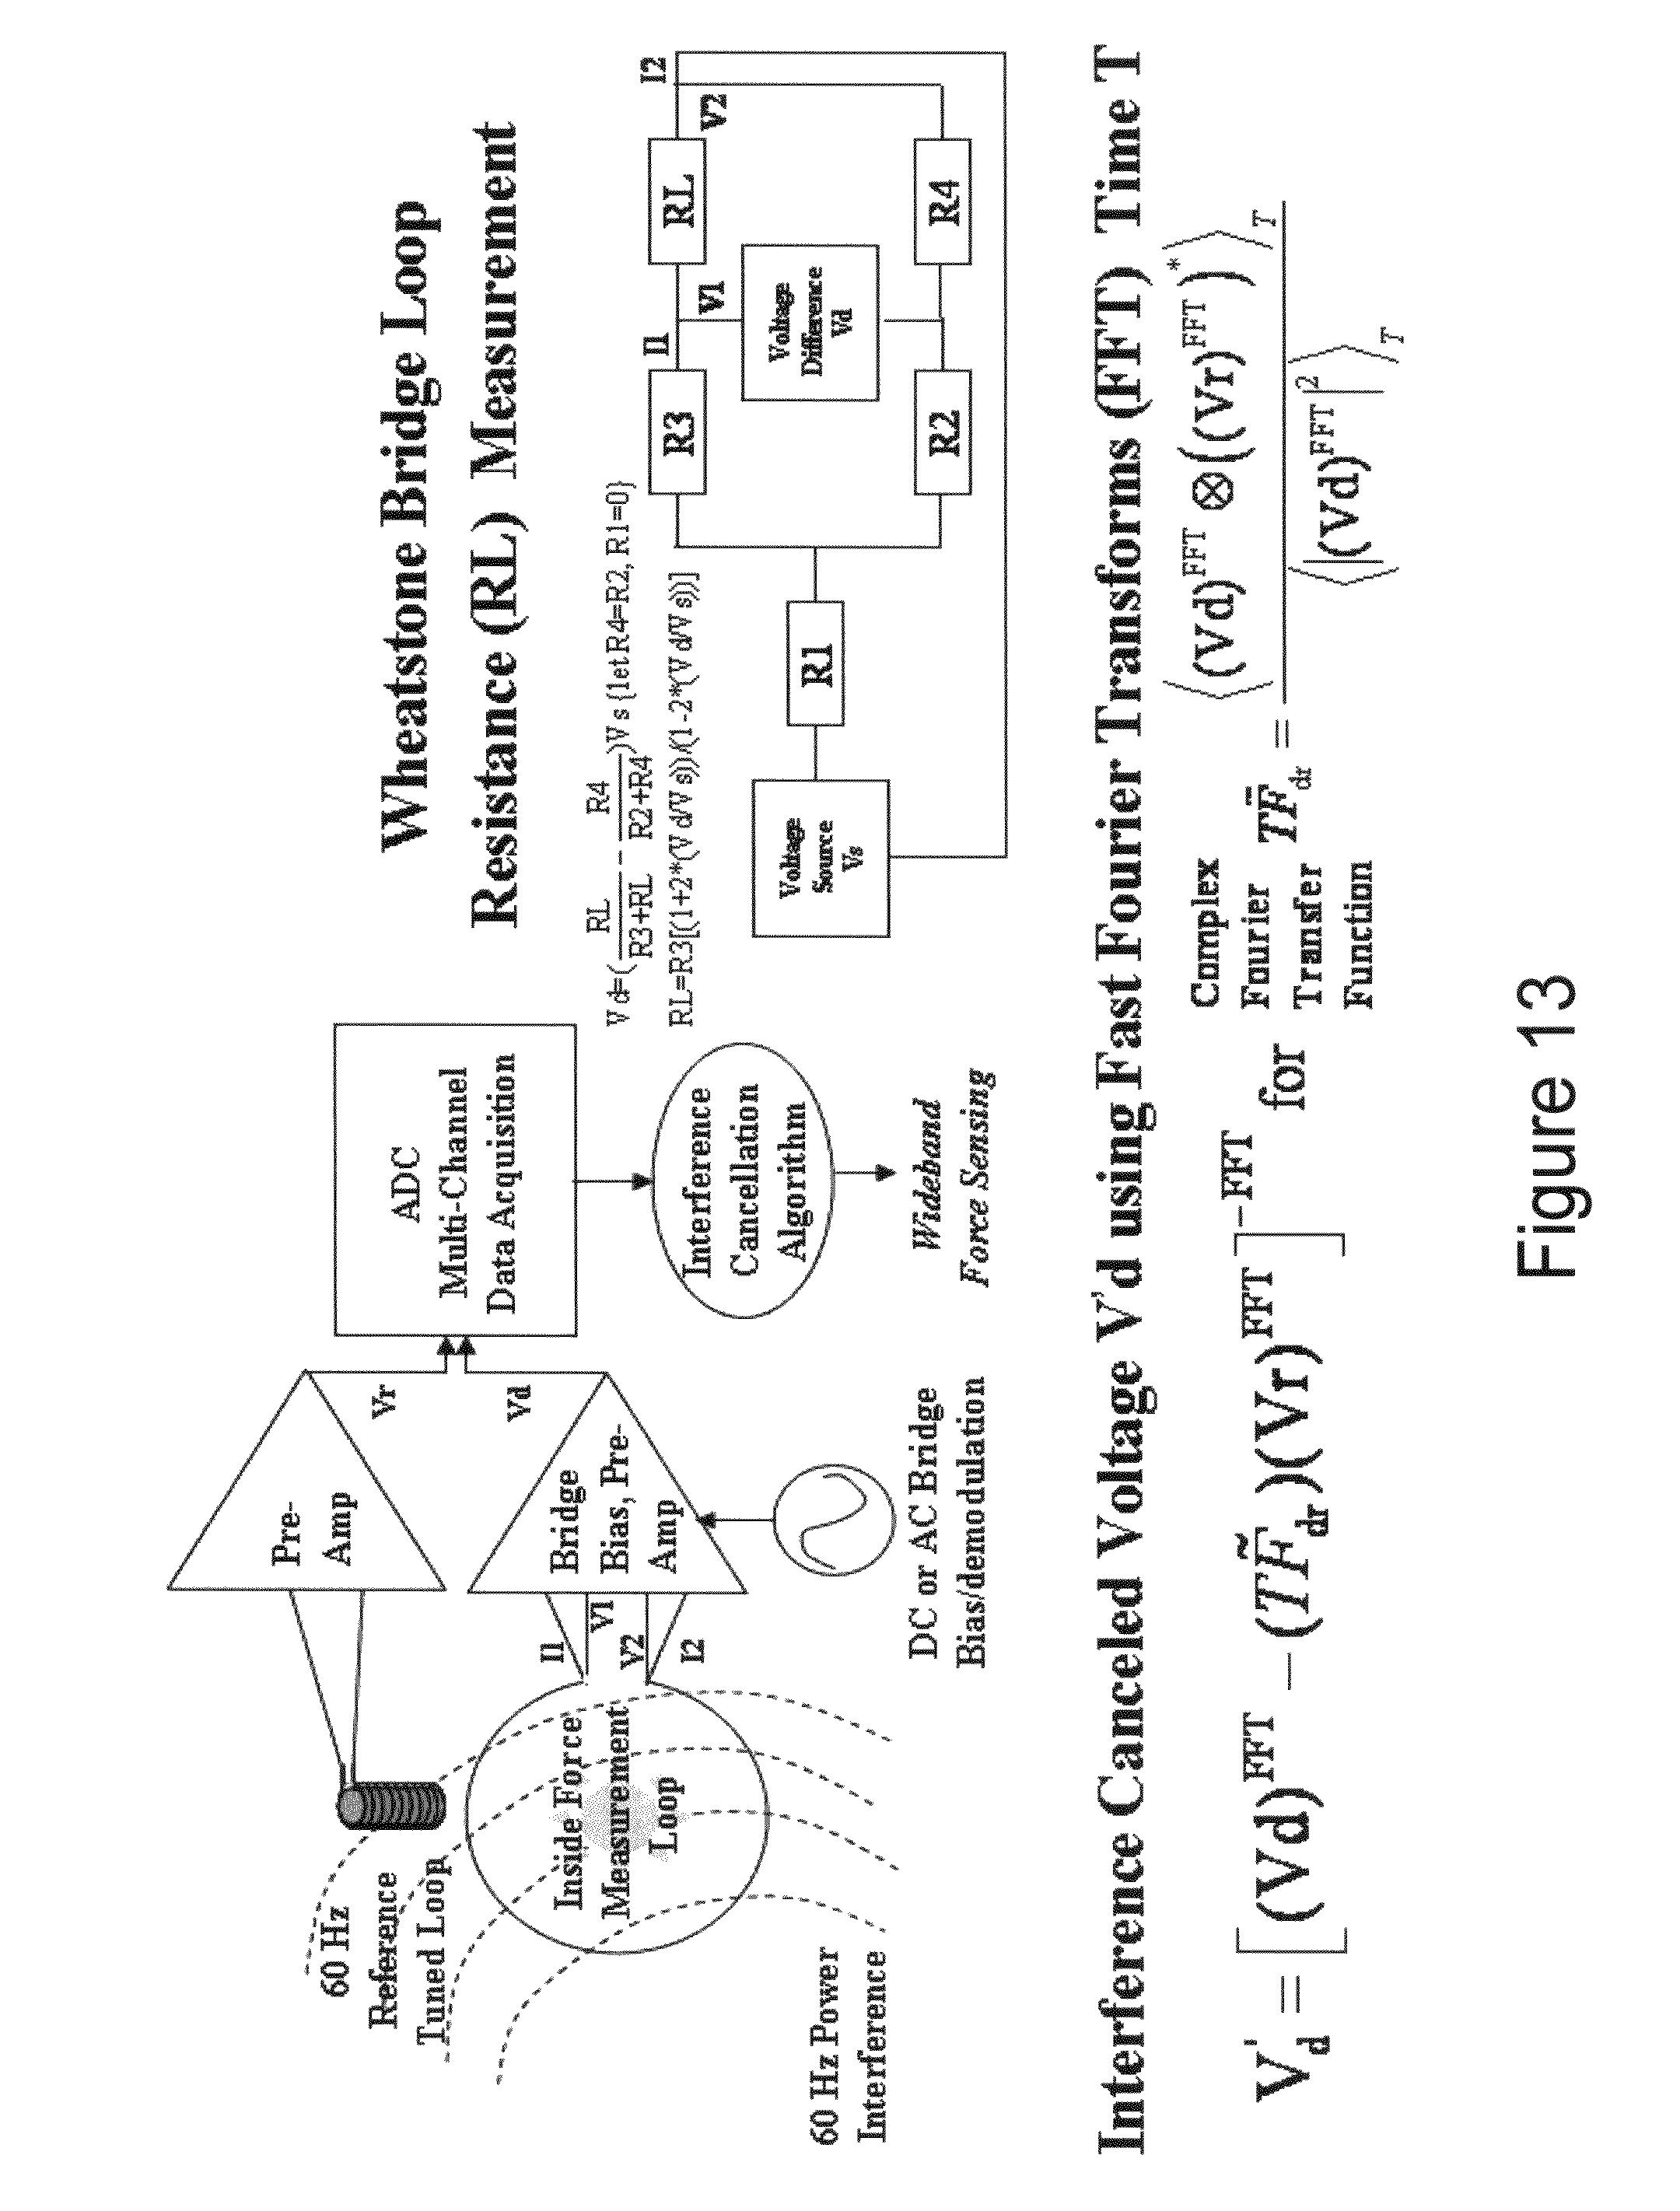 Patent US 8,626,472 B2